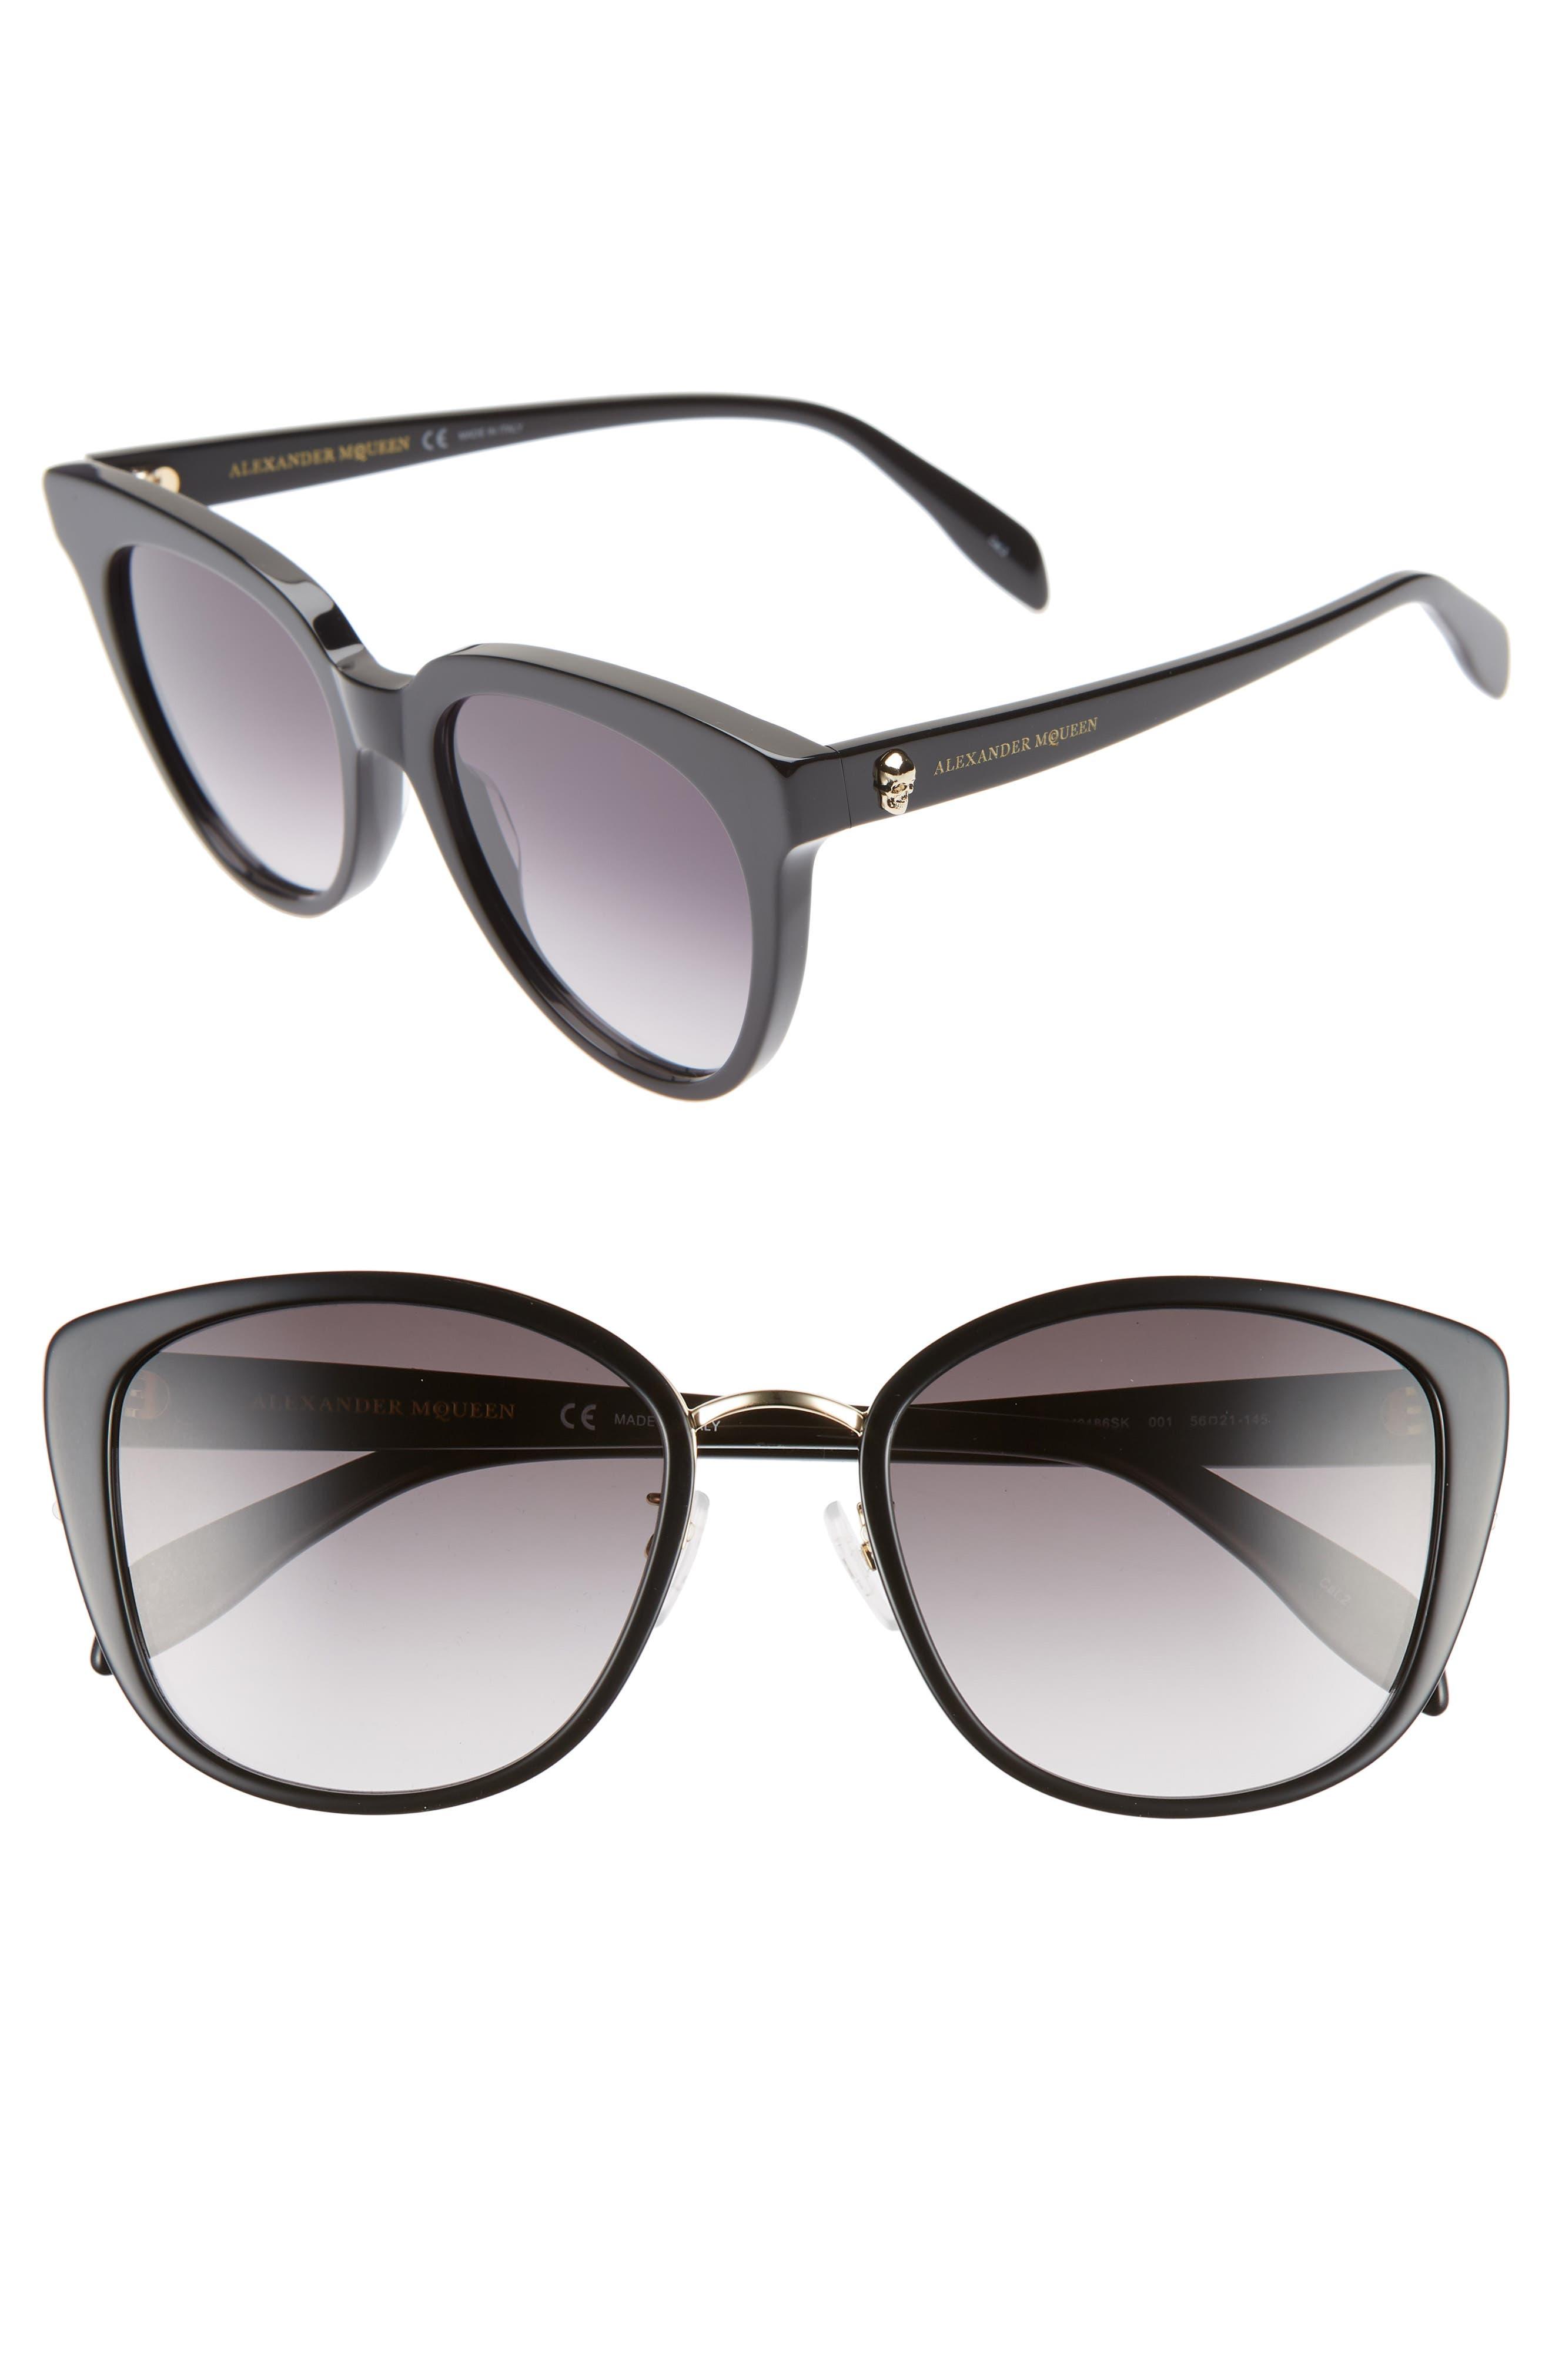 ALEXANDER MCQUEEN,                             56mm Gradient Round Sunglasses,                             Main thumbnail 1, color,                             BLACK/ GOLD